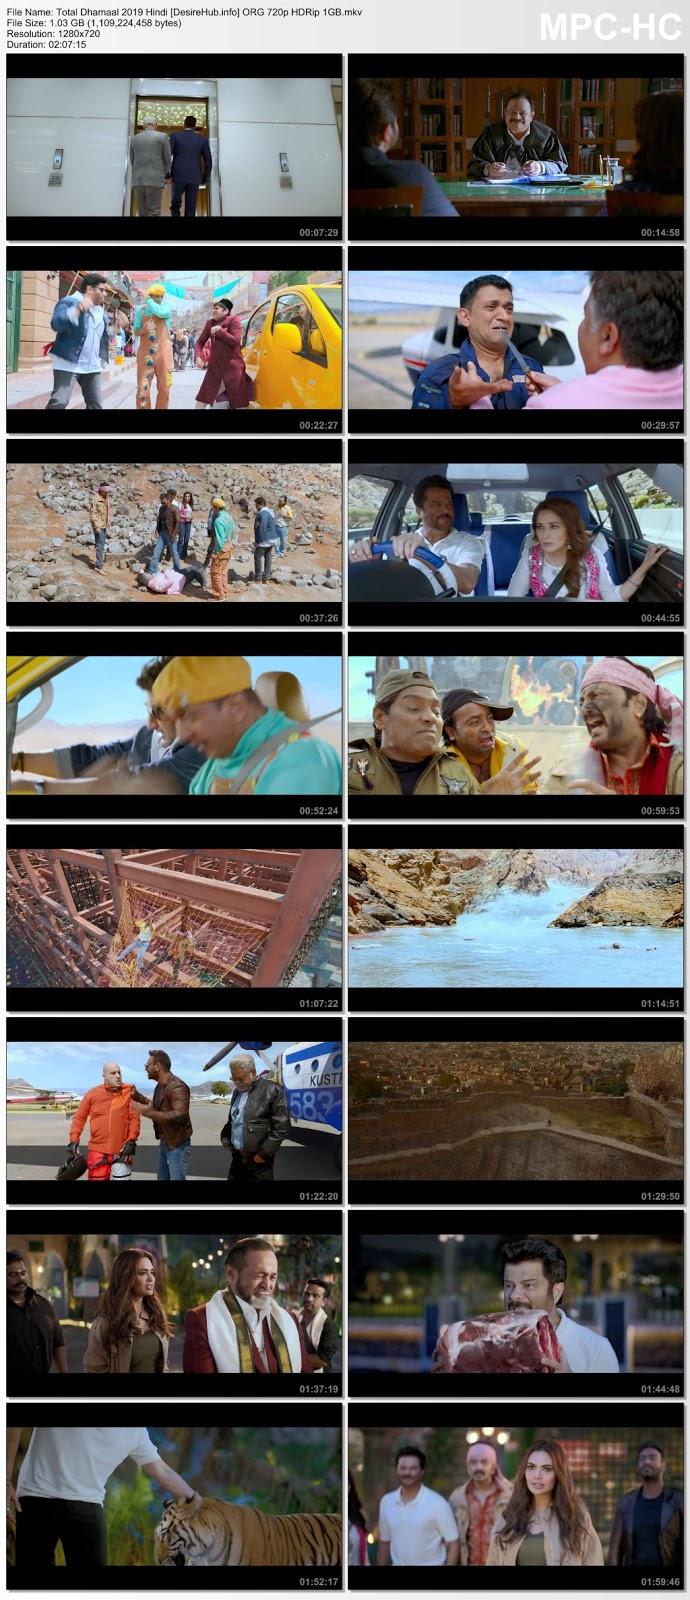 Total Dhamaal 2019 Hindi ORG 720p HDRip 1GB Desirehub